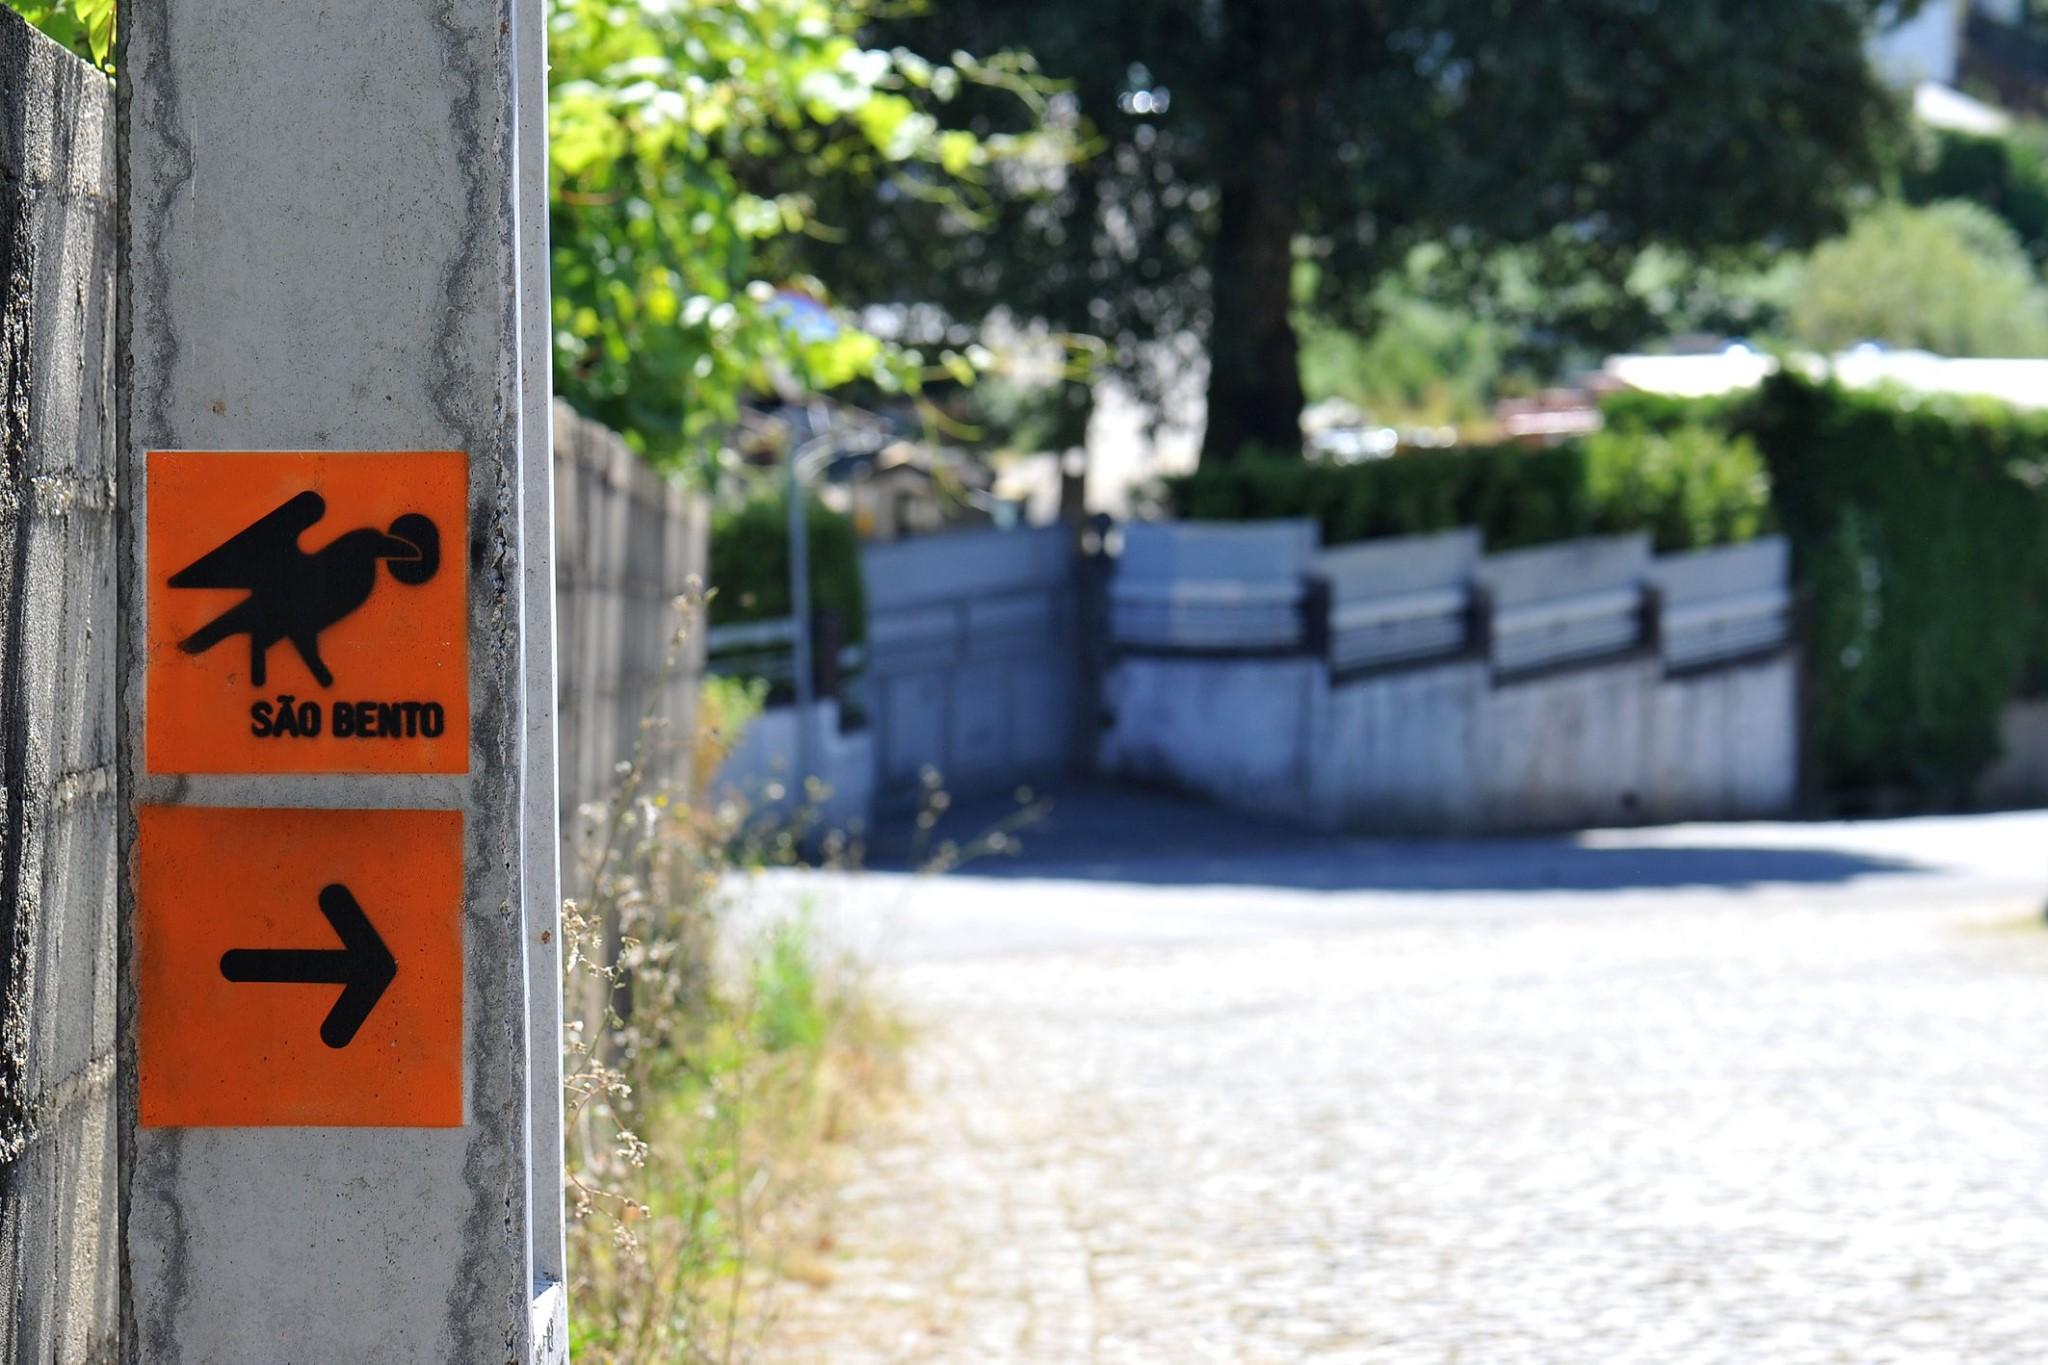 Barcelos sinaliza Caminhos de S. Bento